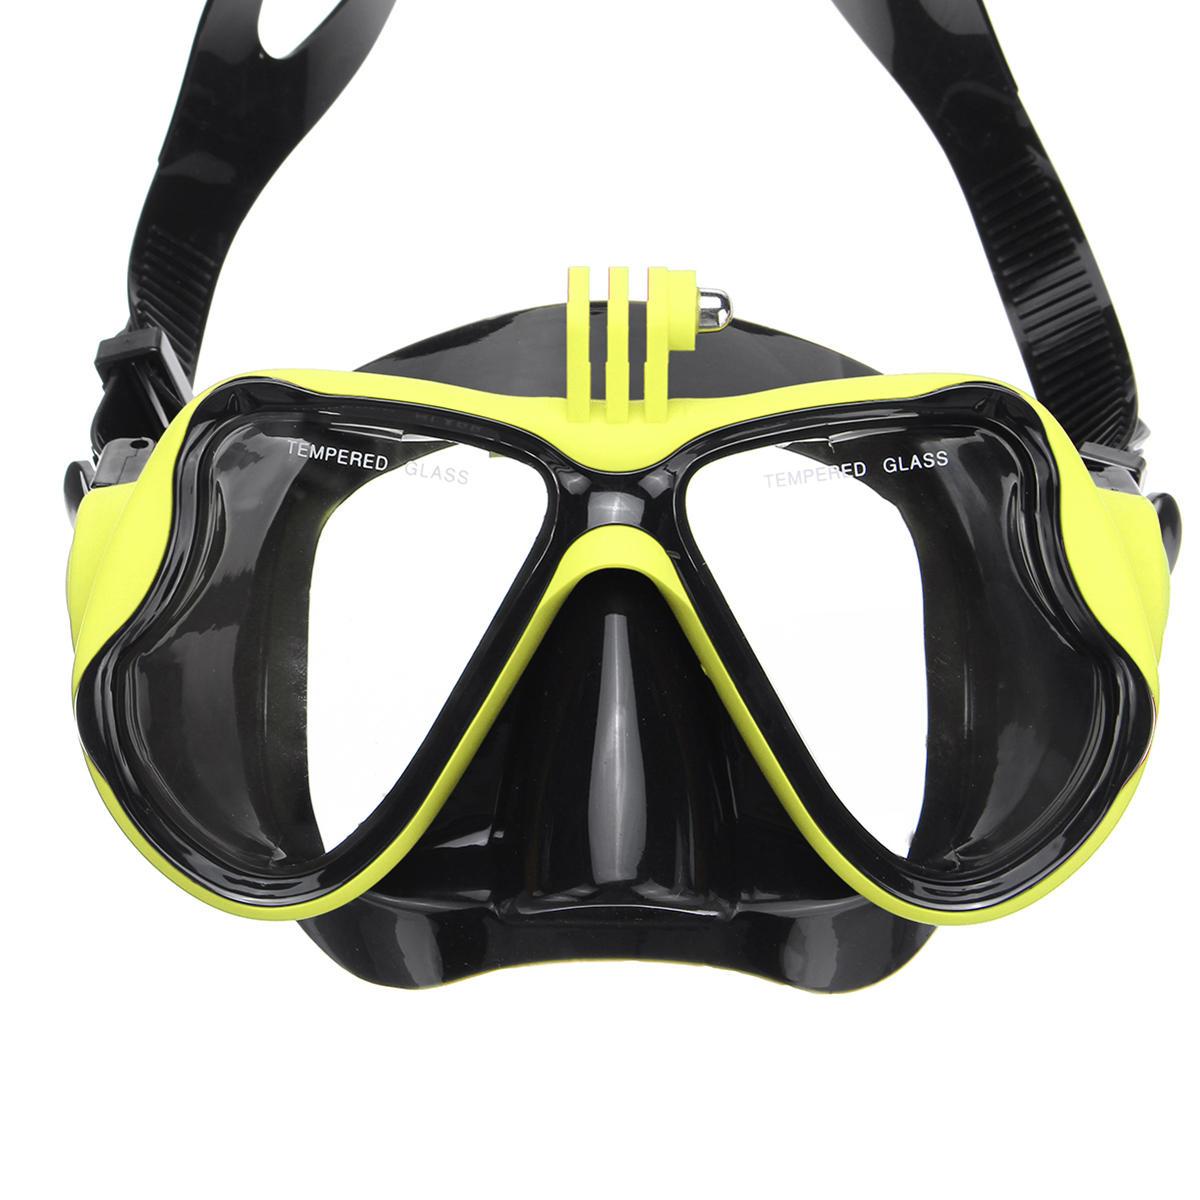 Full Face Diving Mask Snorkel Scuba Swimming Dry Snorkeling Set Free Breath - 4